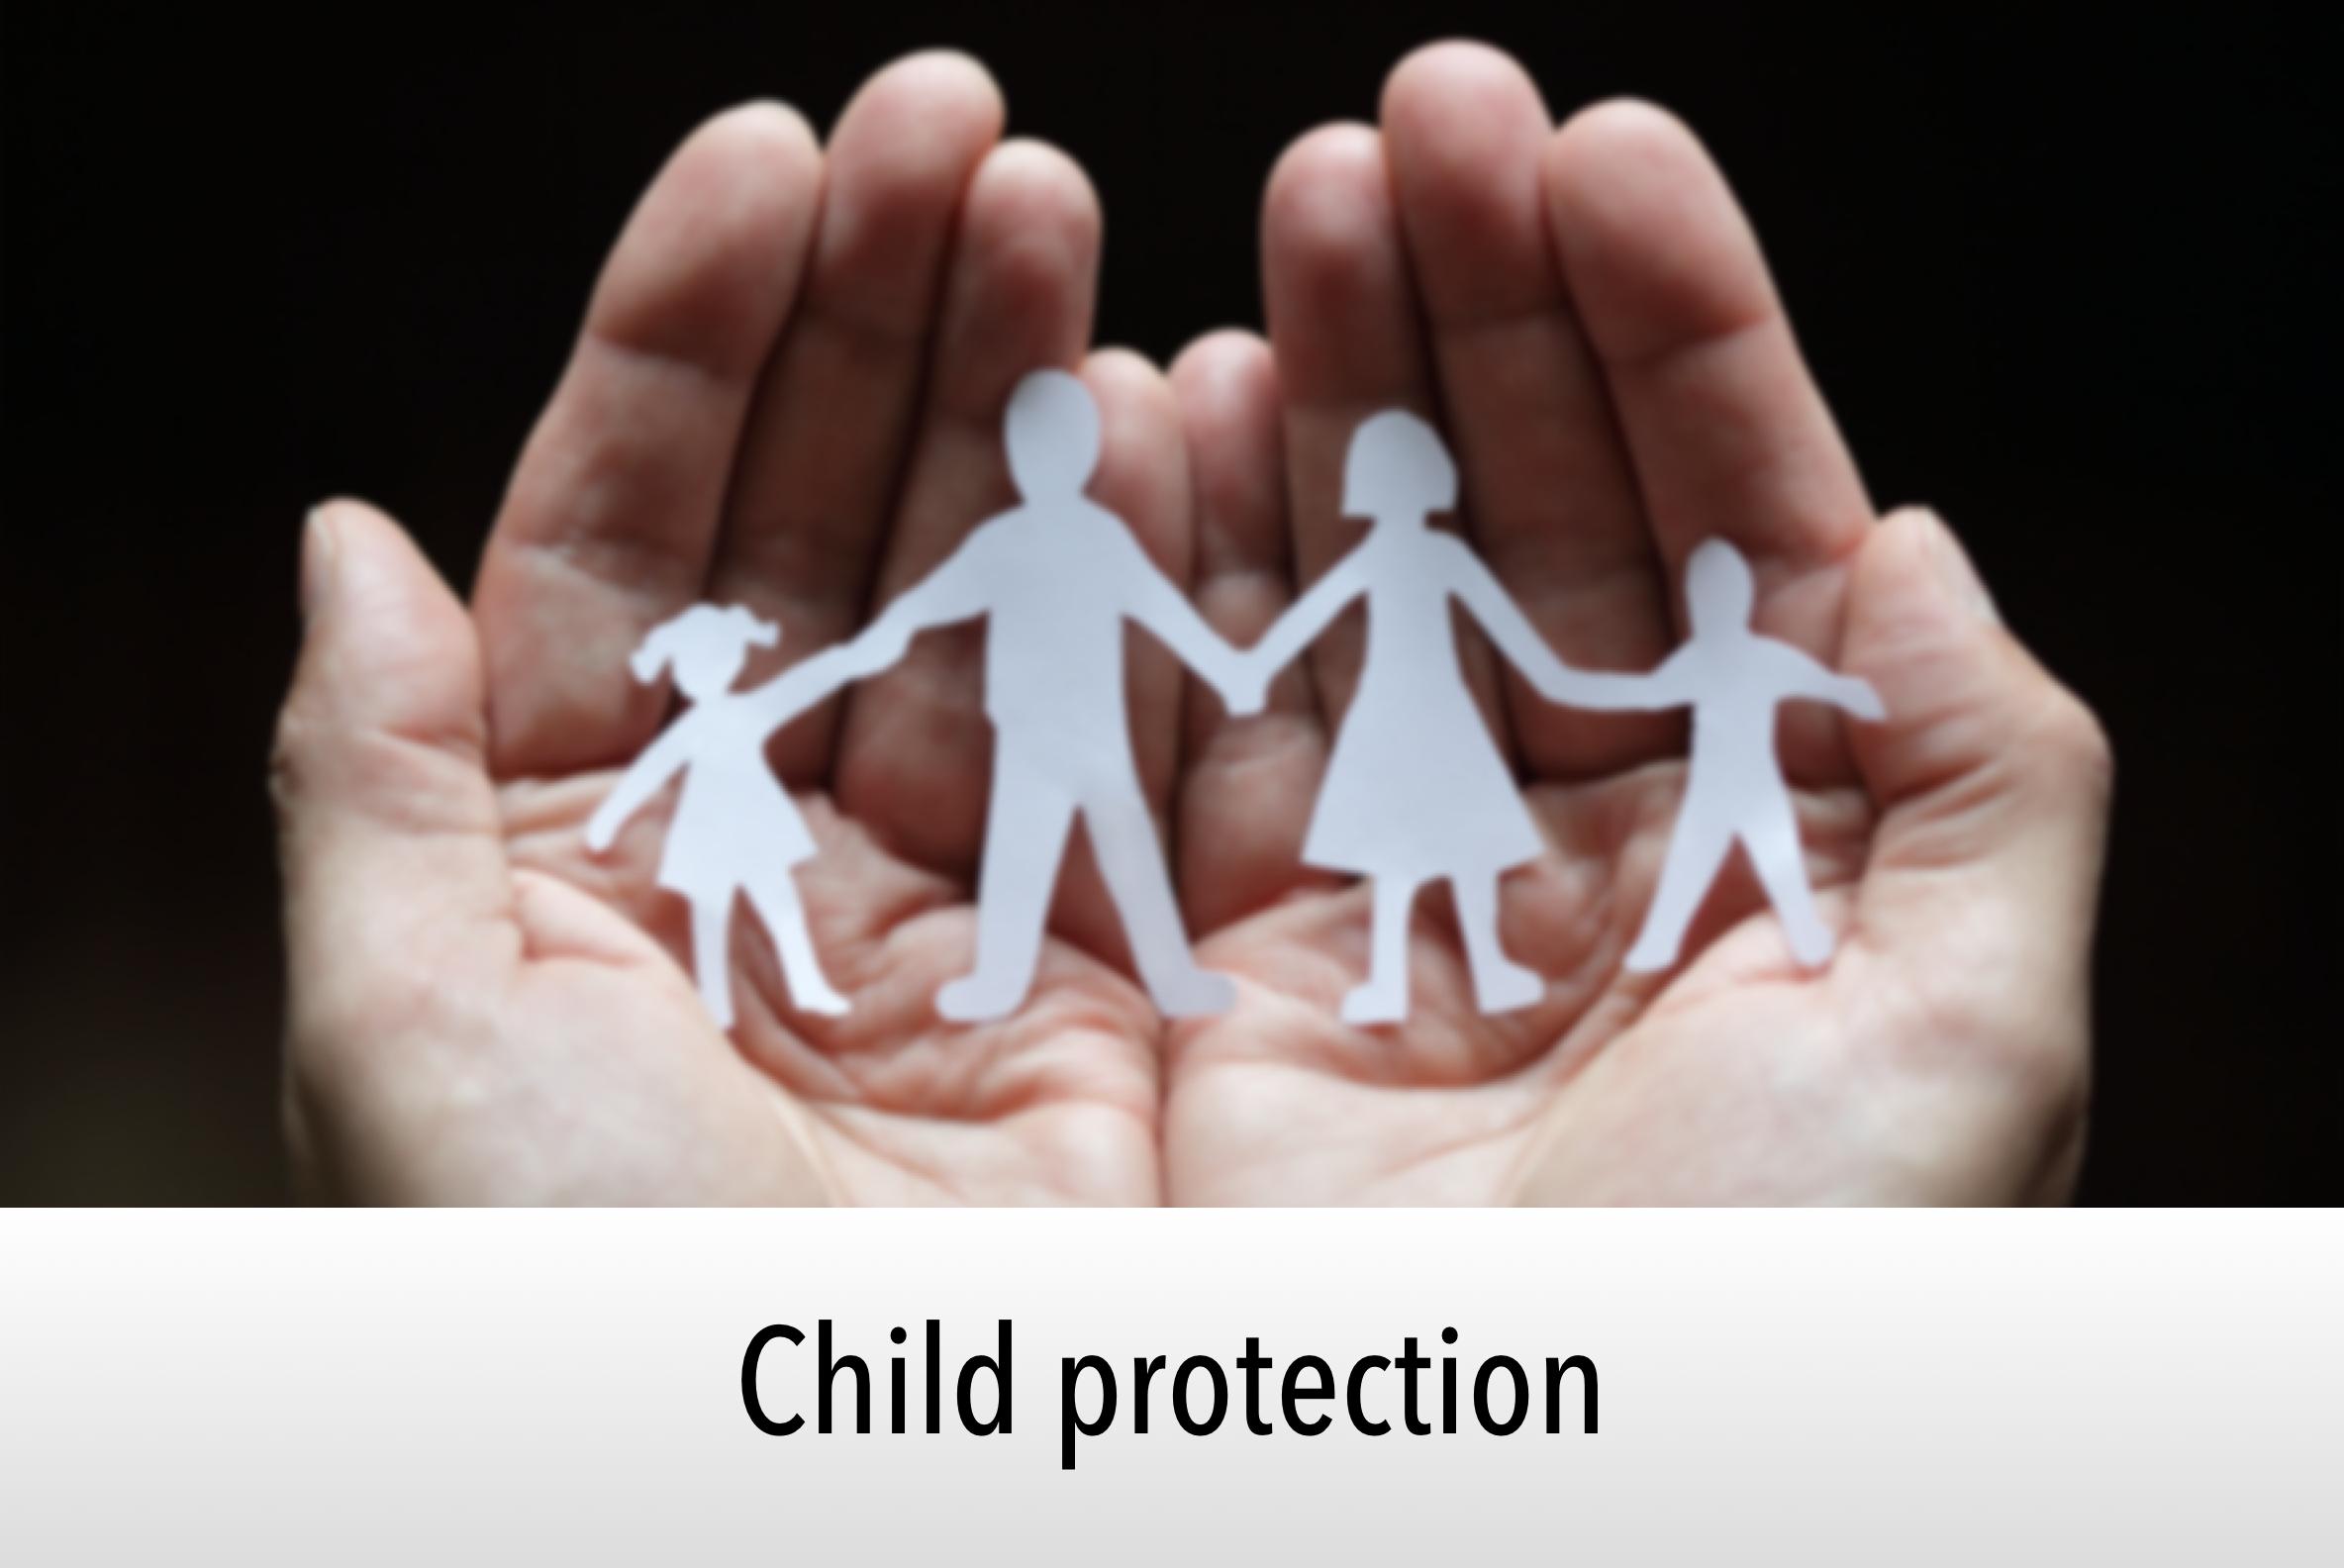 20200928095117 id 767b0778 cc14 4168 ac9e c0410ab52292  child protection 300dpi